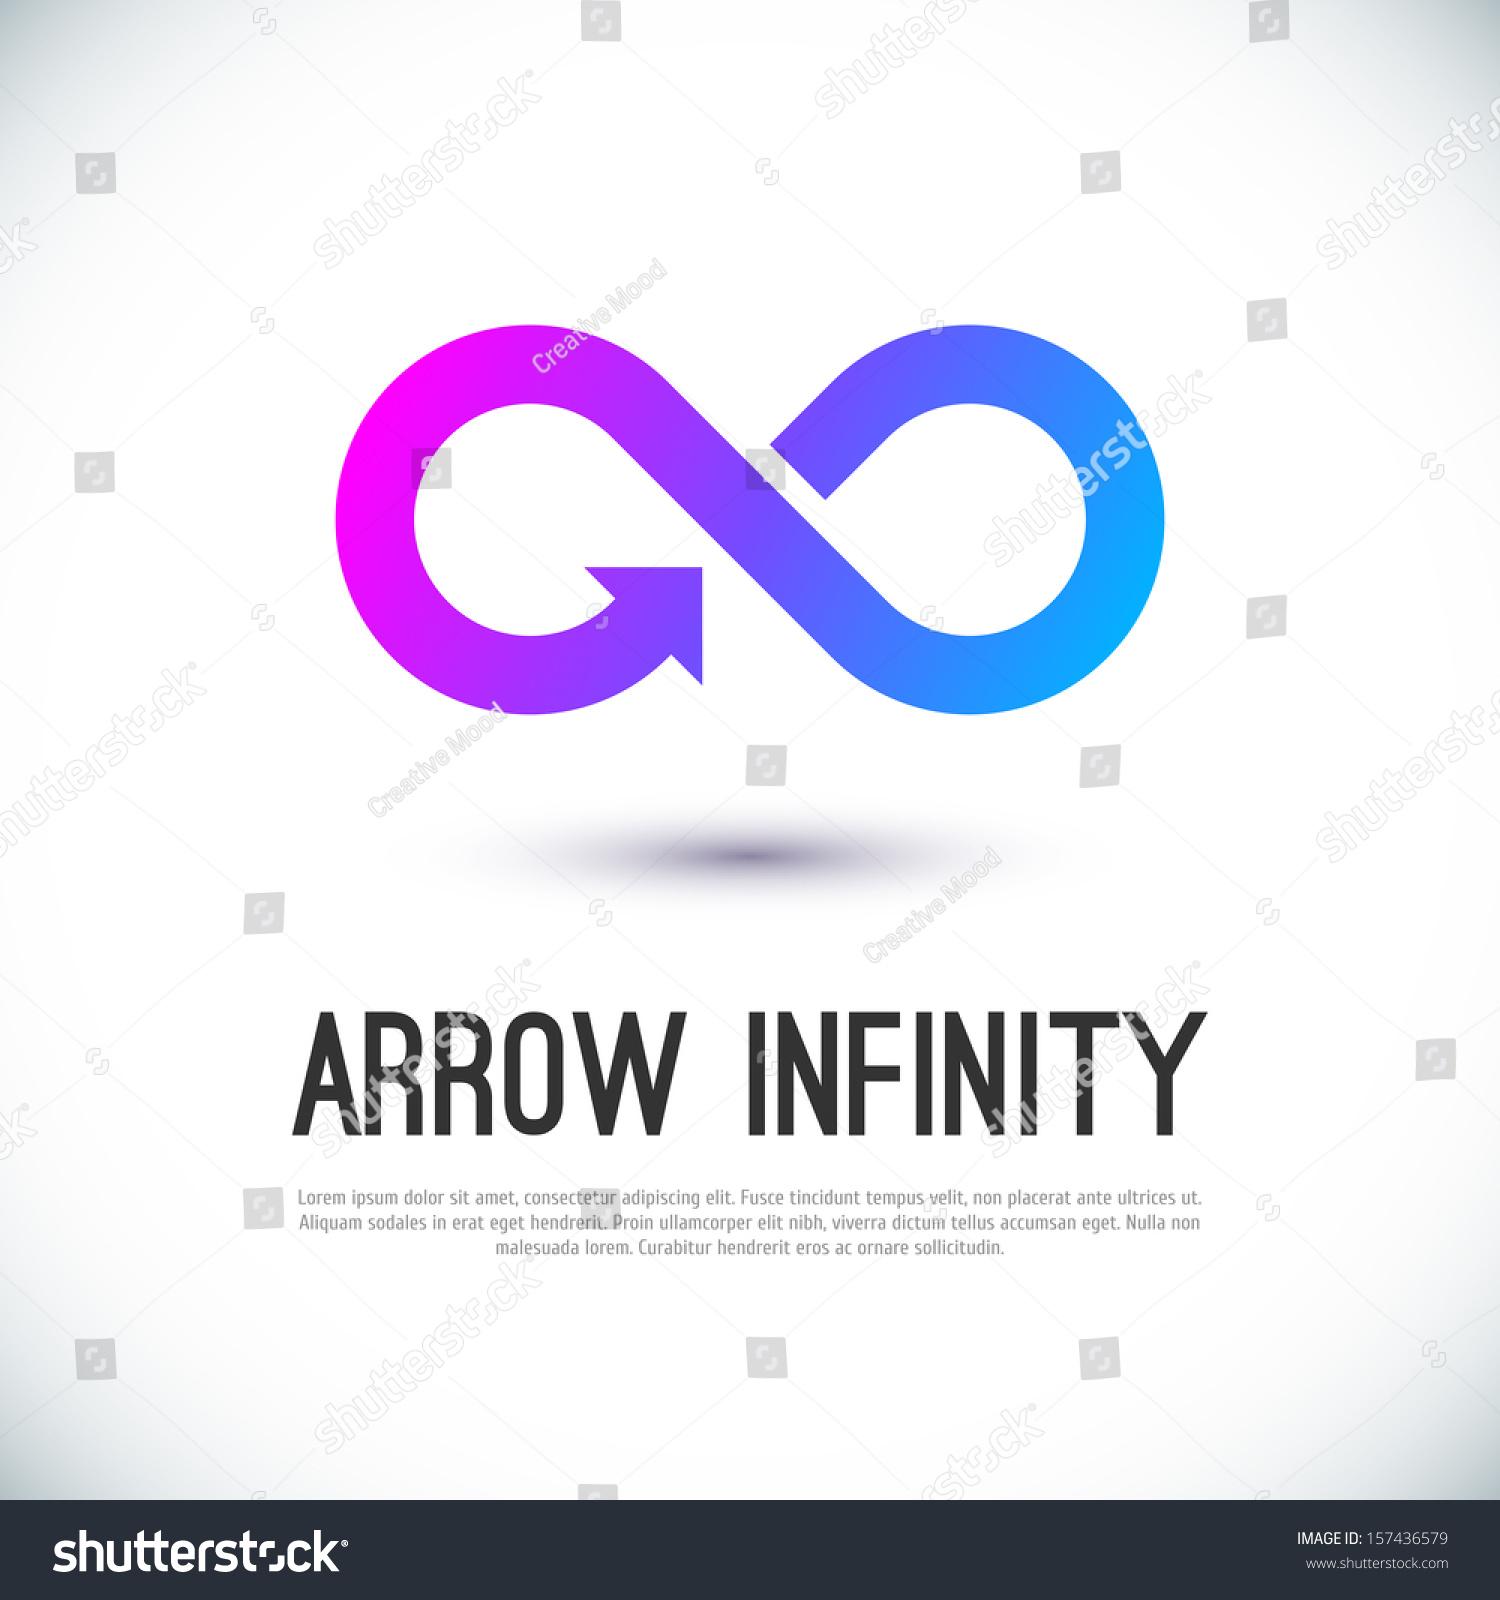 Vector graphic design business logo - Arrow Infinity Business Vector Logo Design Template For Your Design